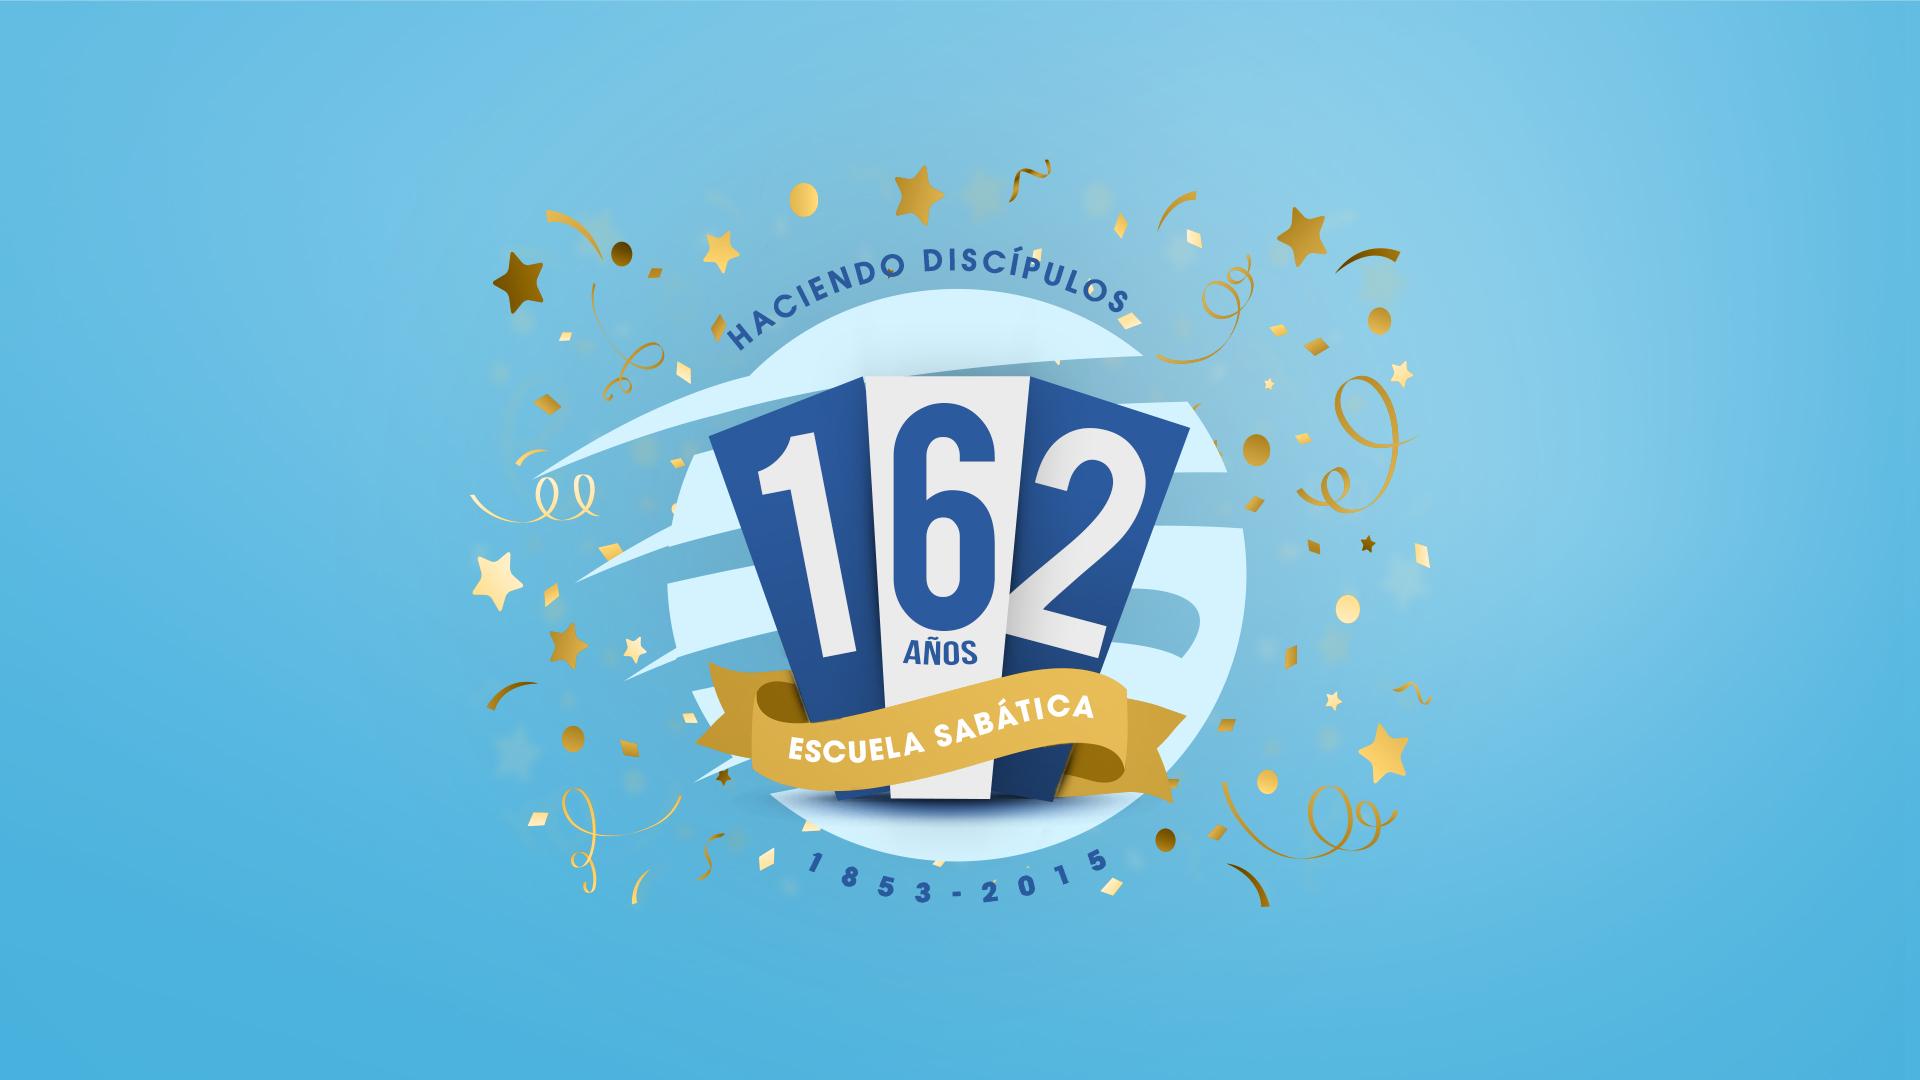 162 Anos fazendo Discípulos